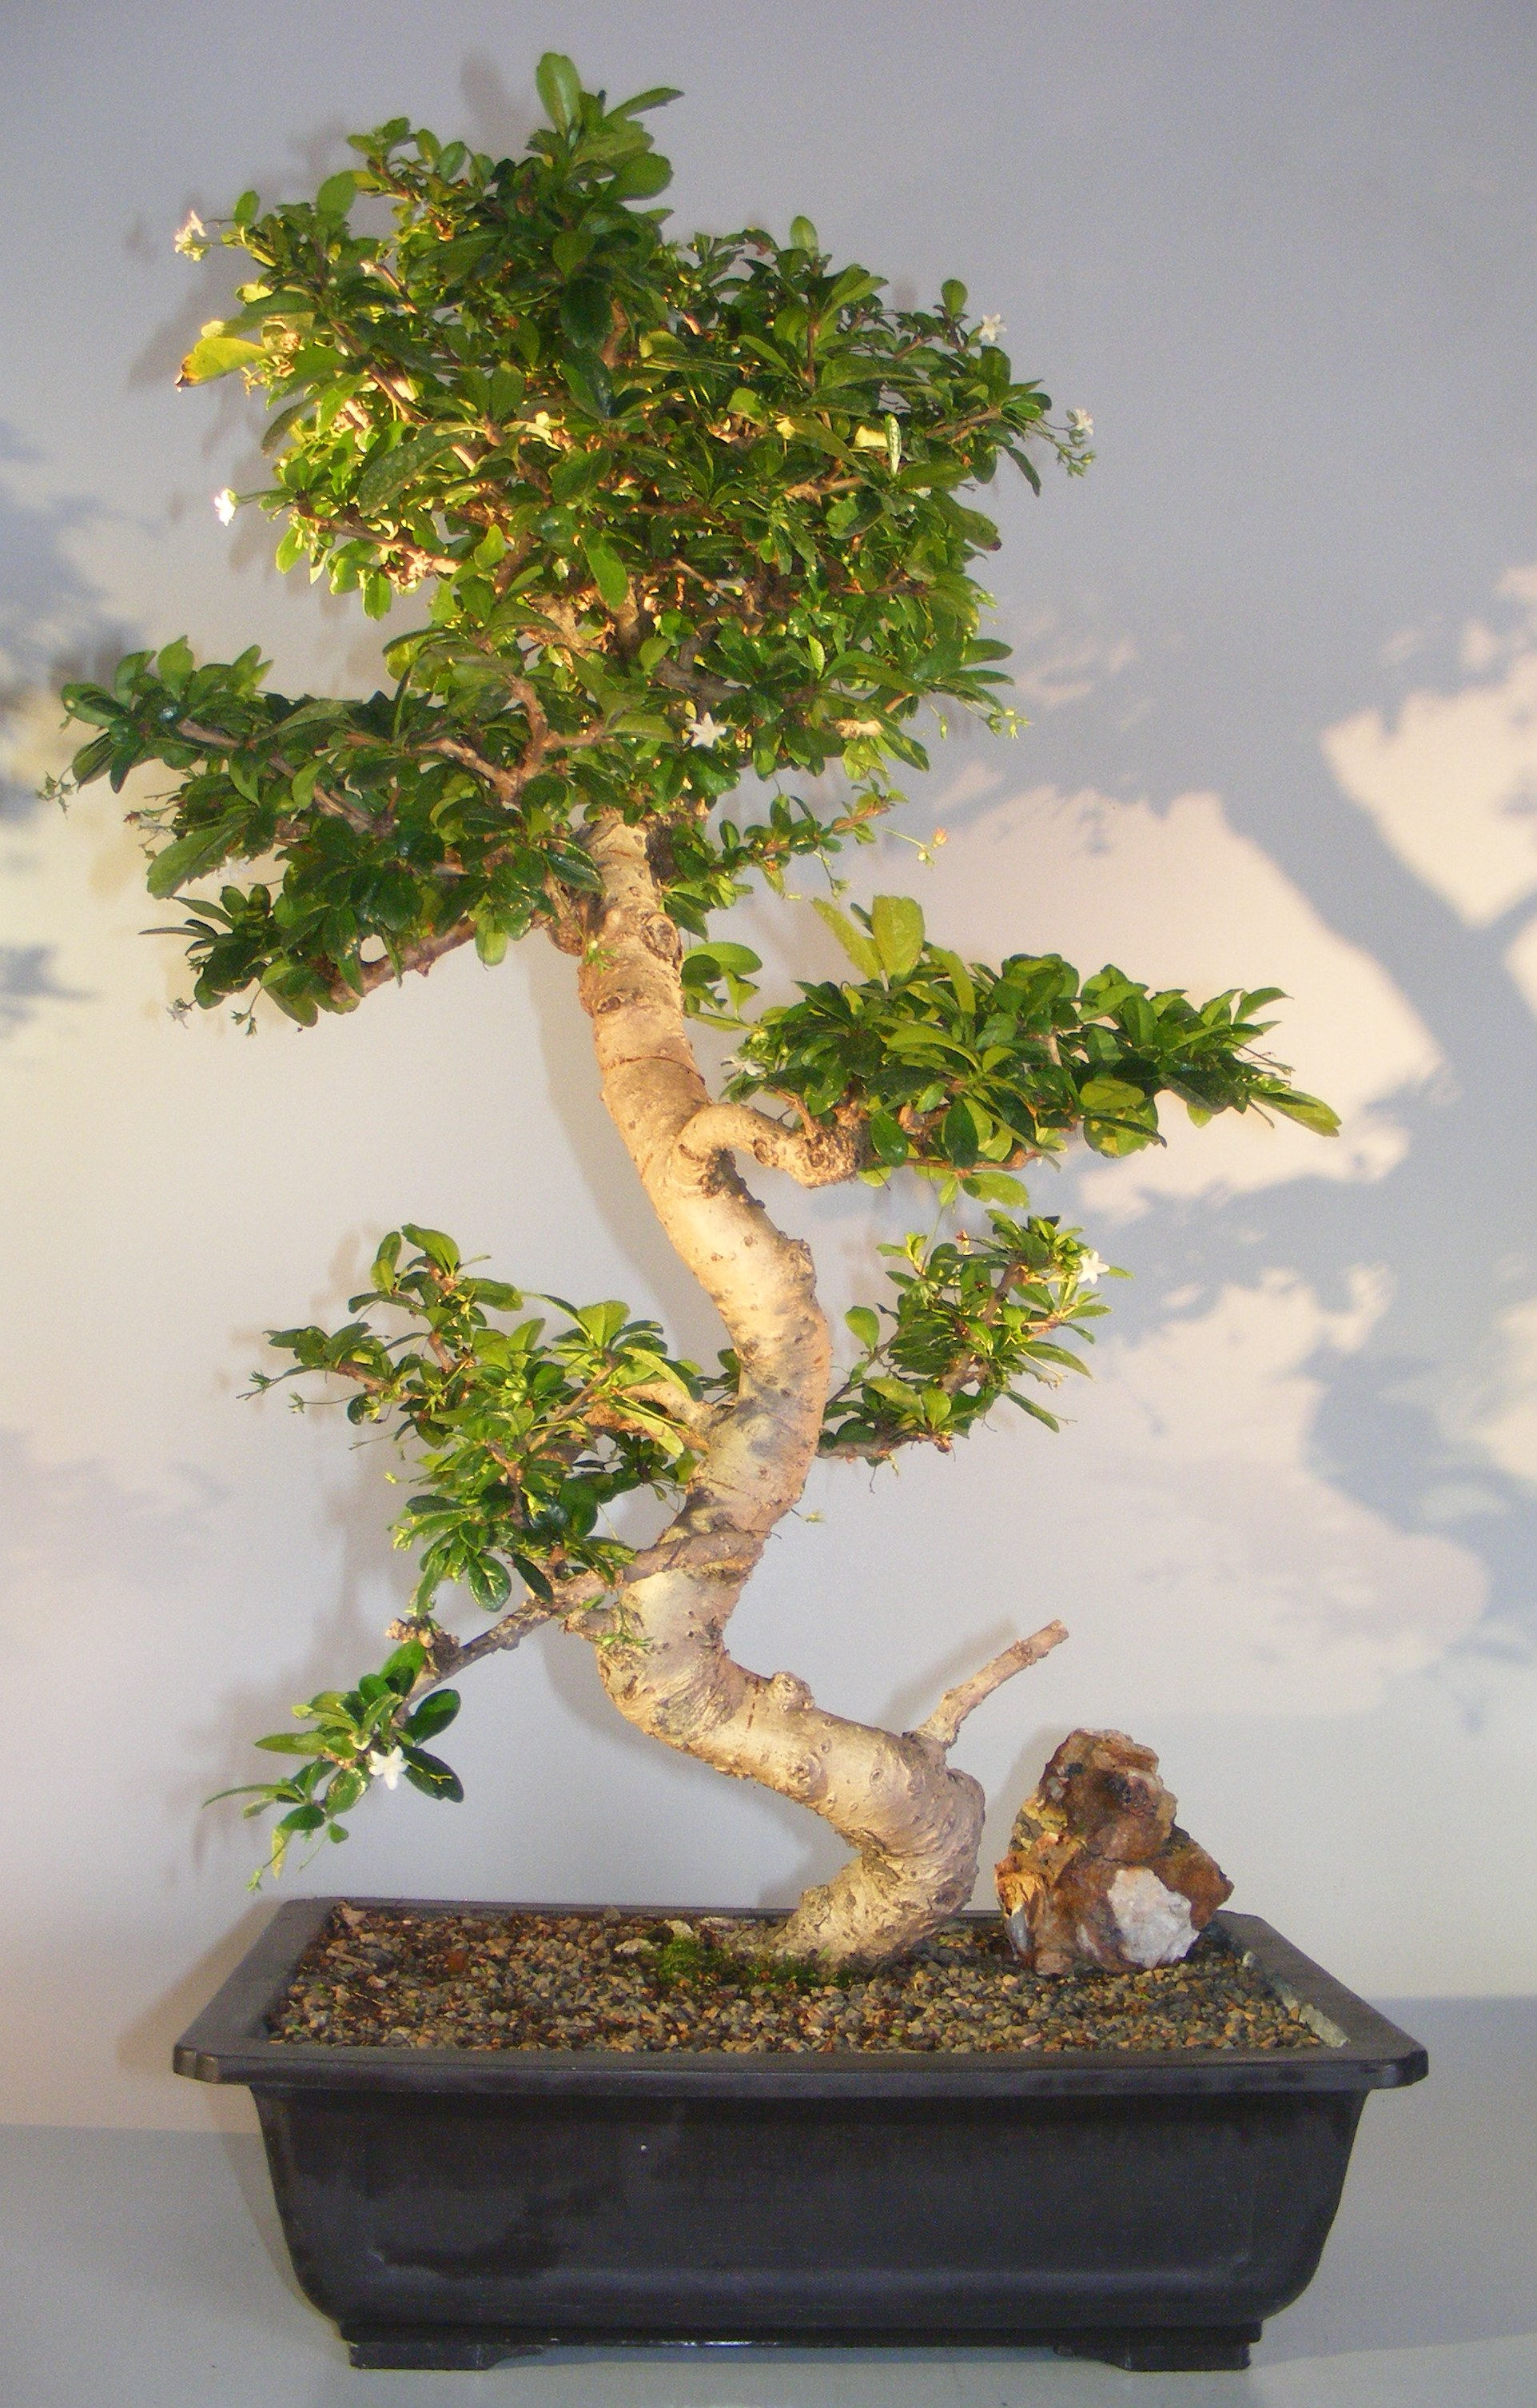 Flowering Fukien Tea Bonsai Tree Curved Trunk & Tiered Branching (ehretia microphylla) Image